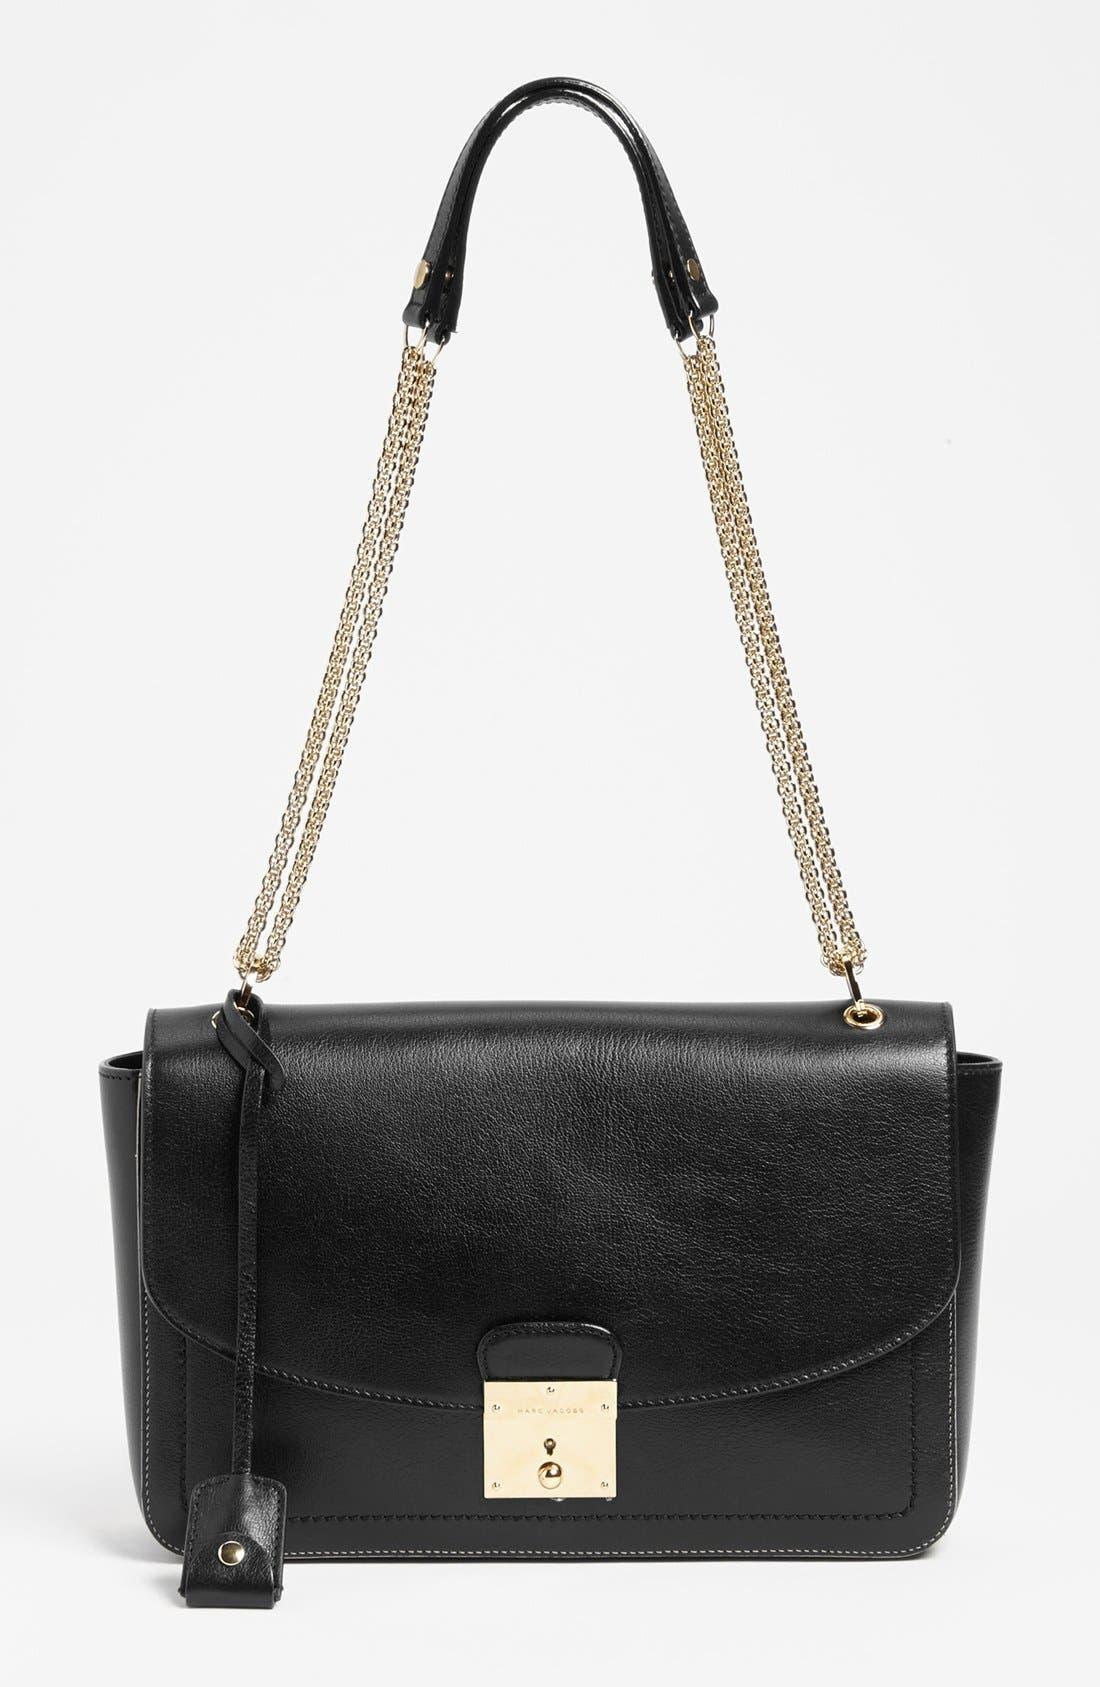 Main Image - MARC JACOBS '1984 Polly' Leather Shoulder Bag